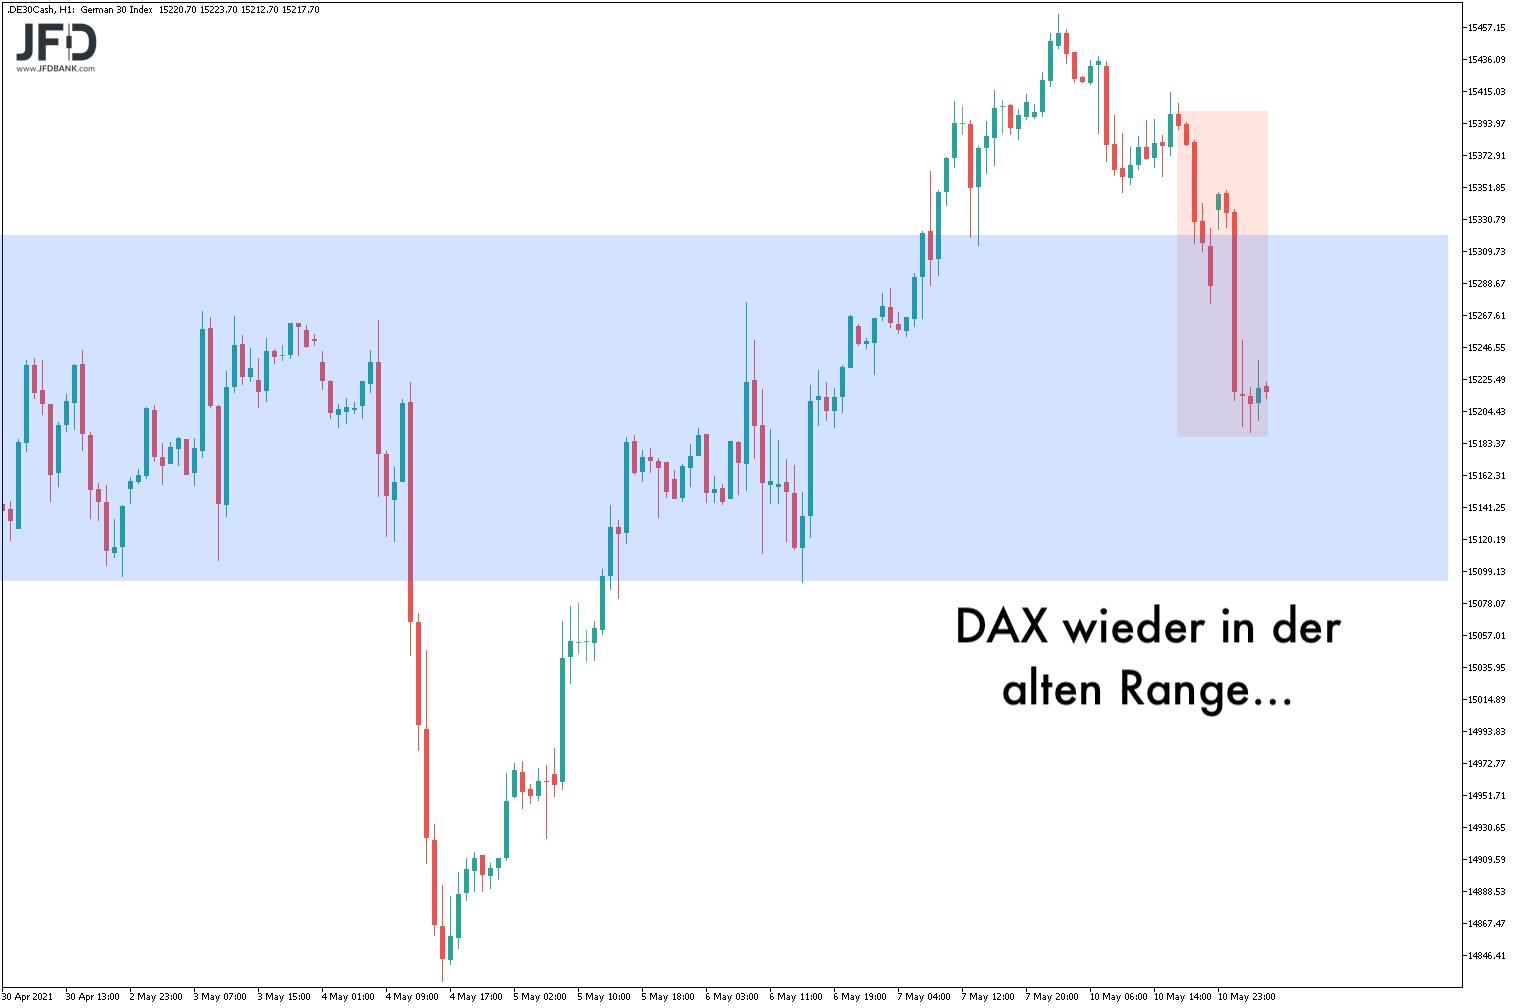 20210511_dax_vorboerse_range.png